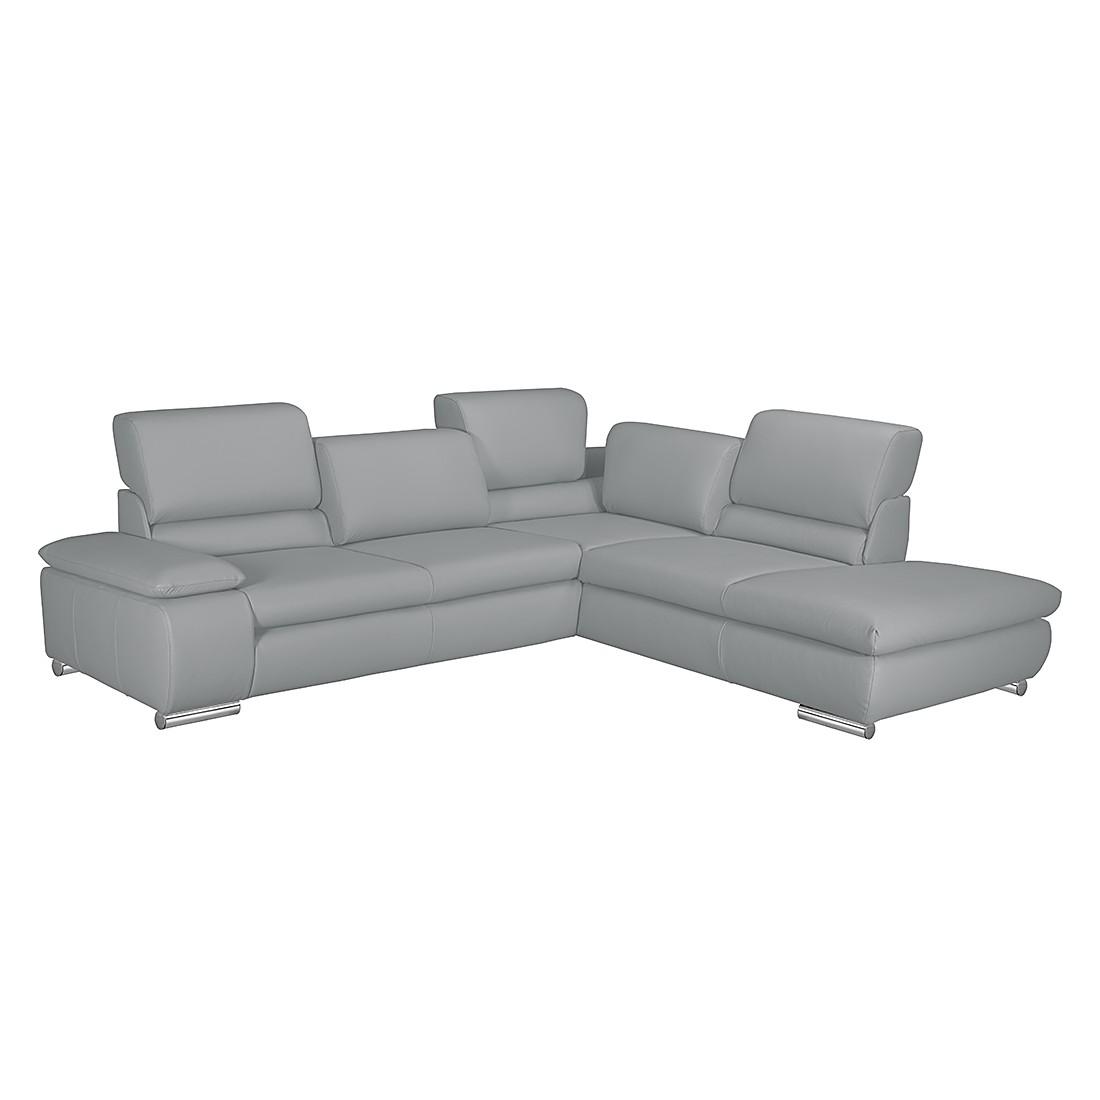 ecksofa tetony mit schlaffunktion inspirierendes design f r wohnm bel. Black Bedroom Furniture Sets. Home Design Ideas